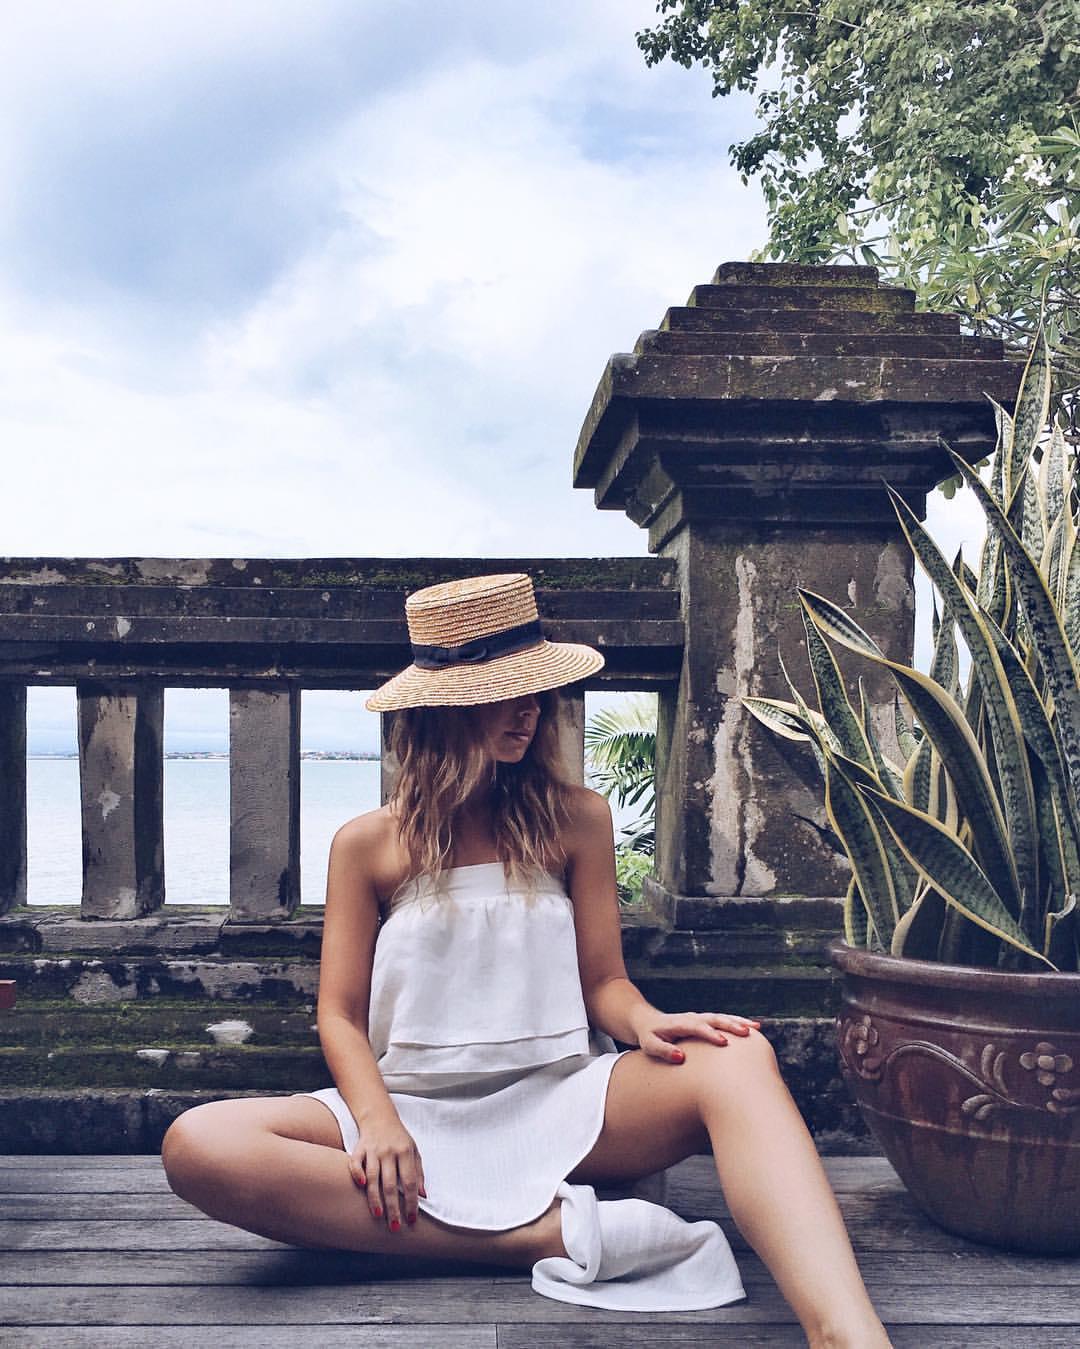 Friend in Fashion, Bali style.jpg